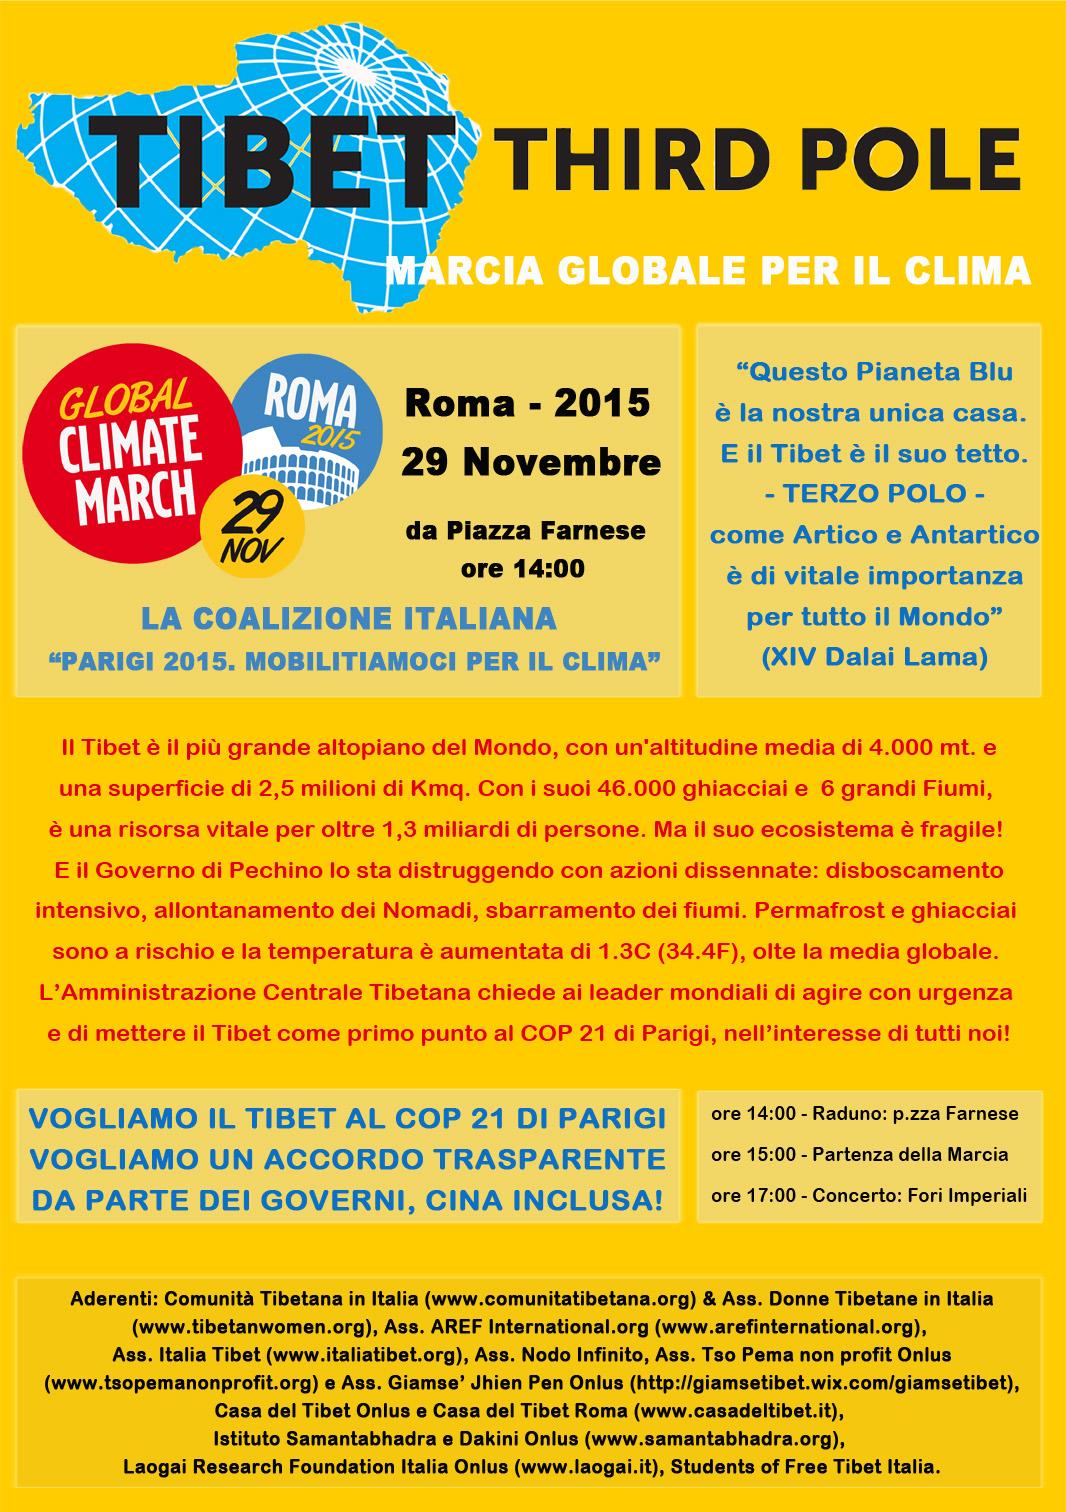 locandina italia -tibet EVENTO 2